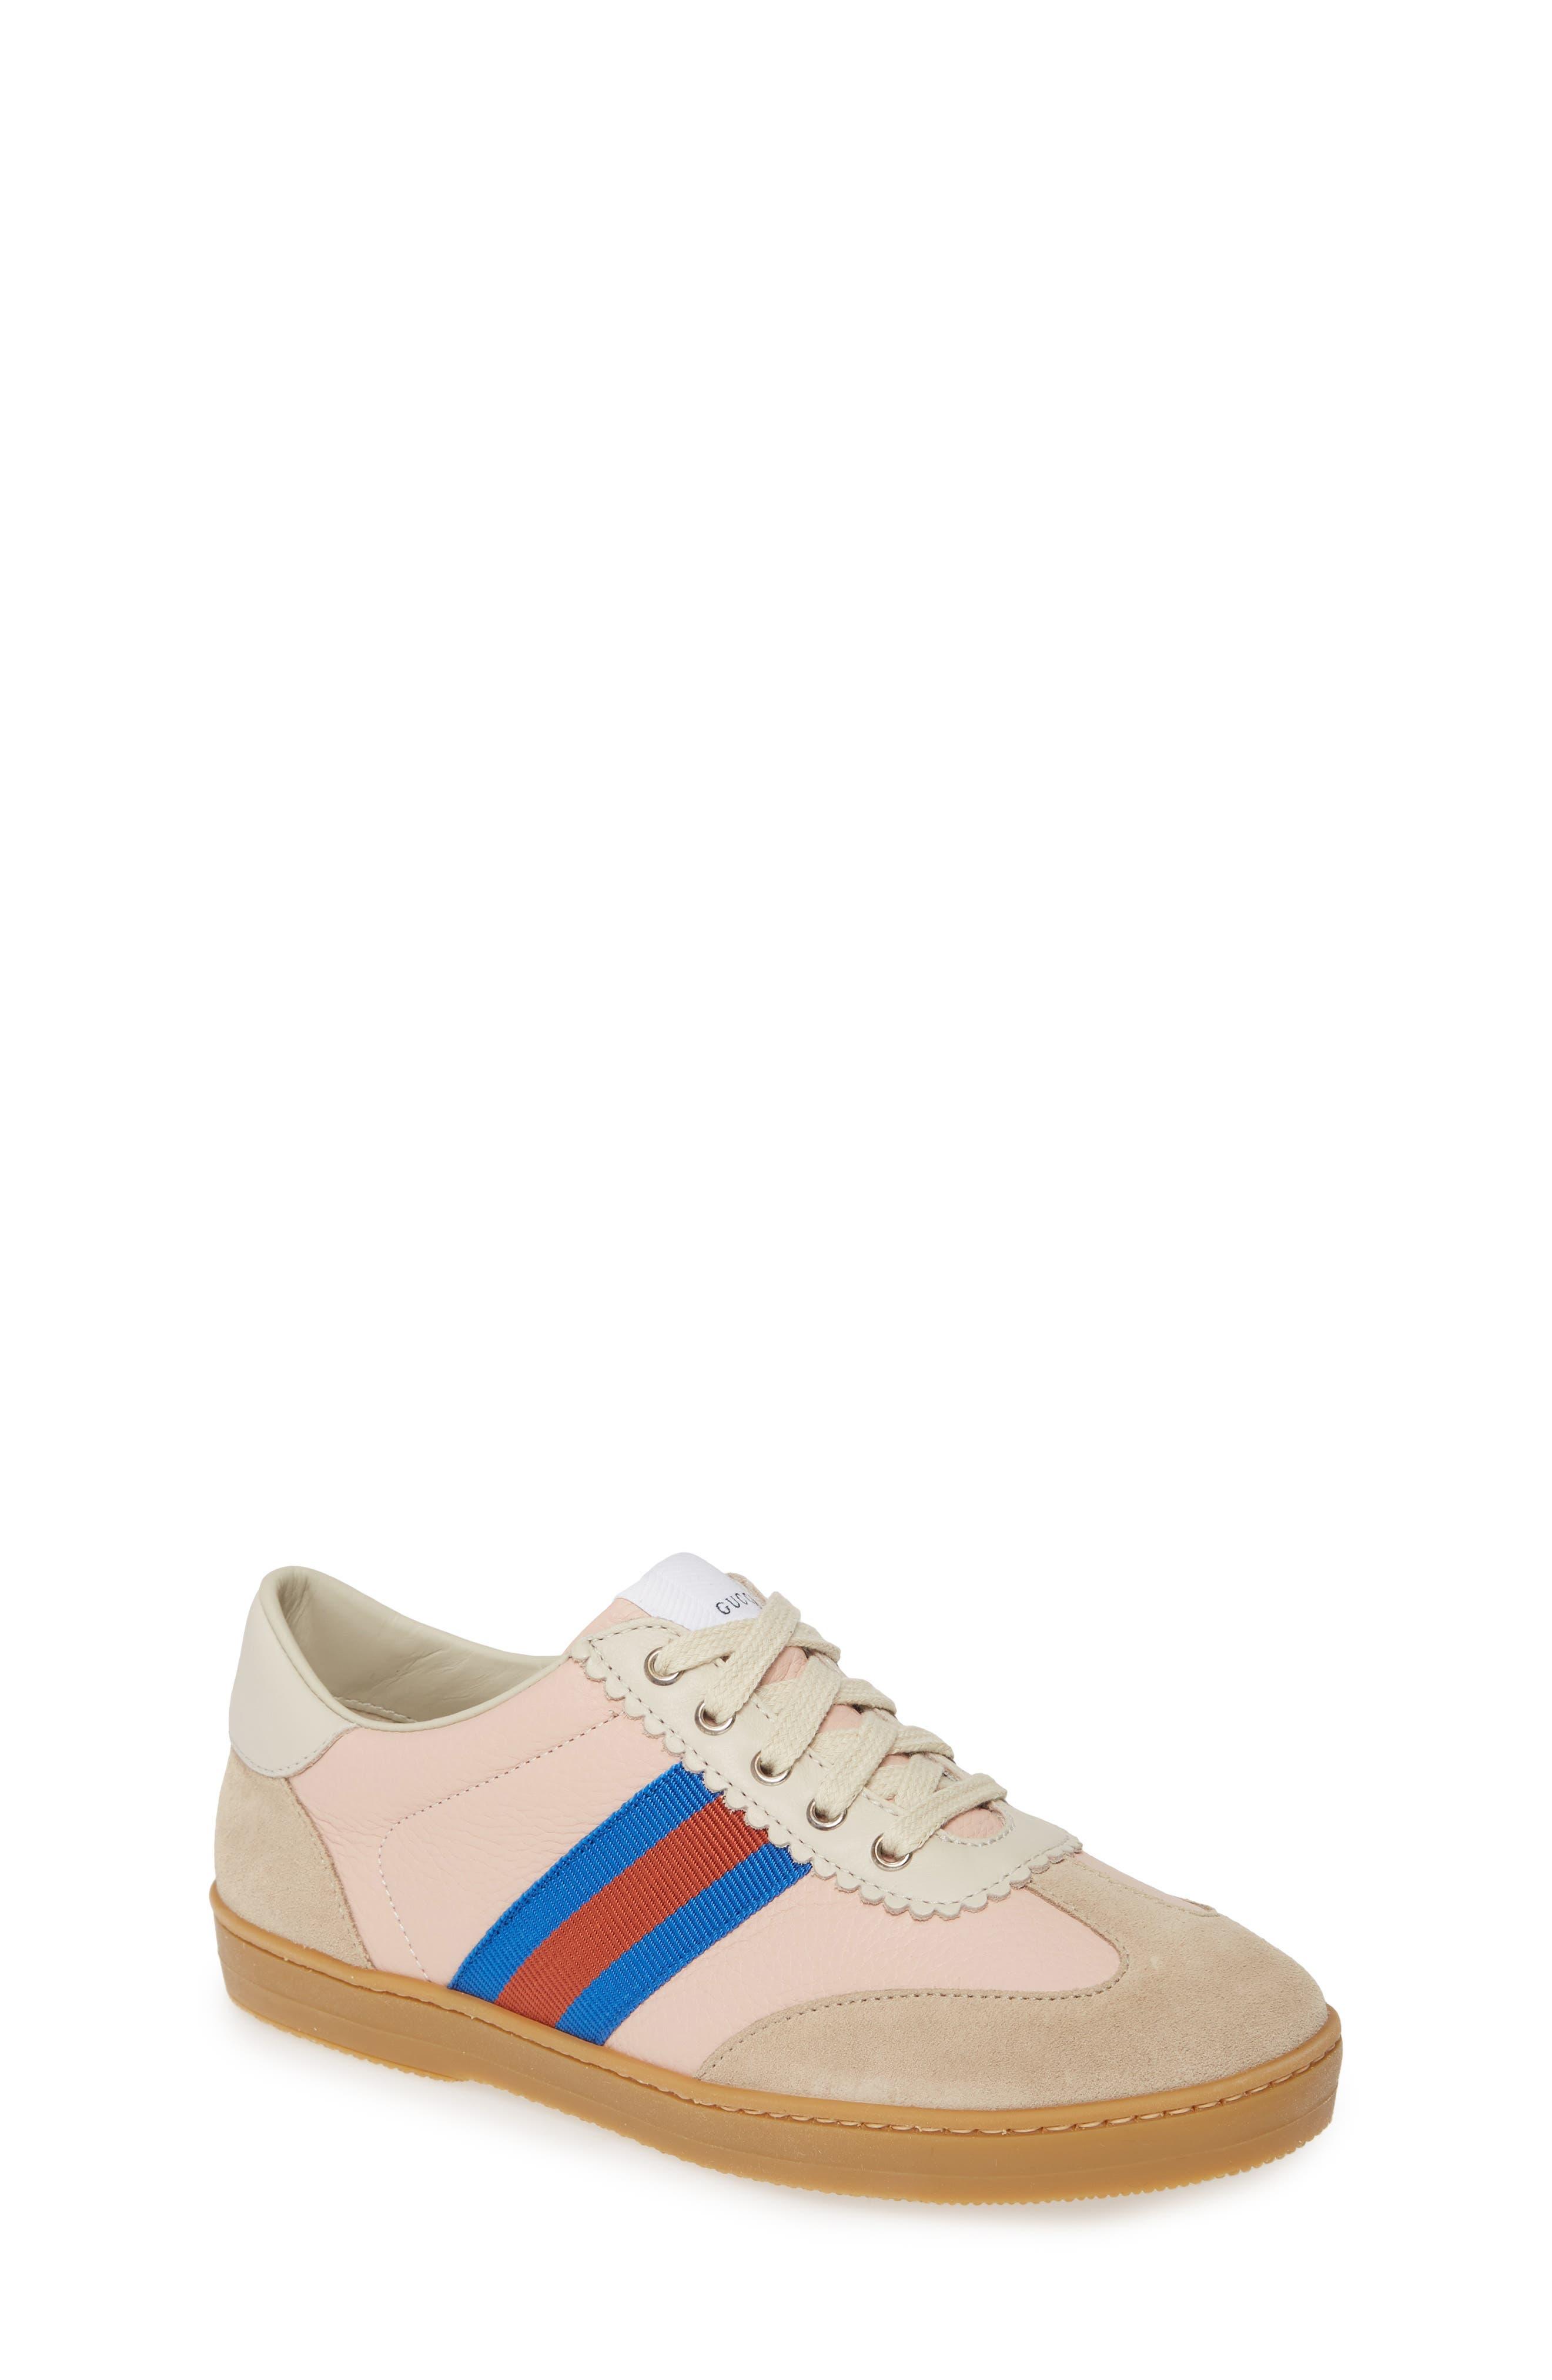 Gucci G74 Low Top Sneaker